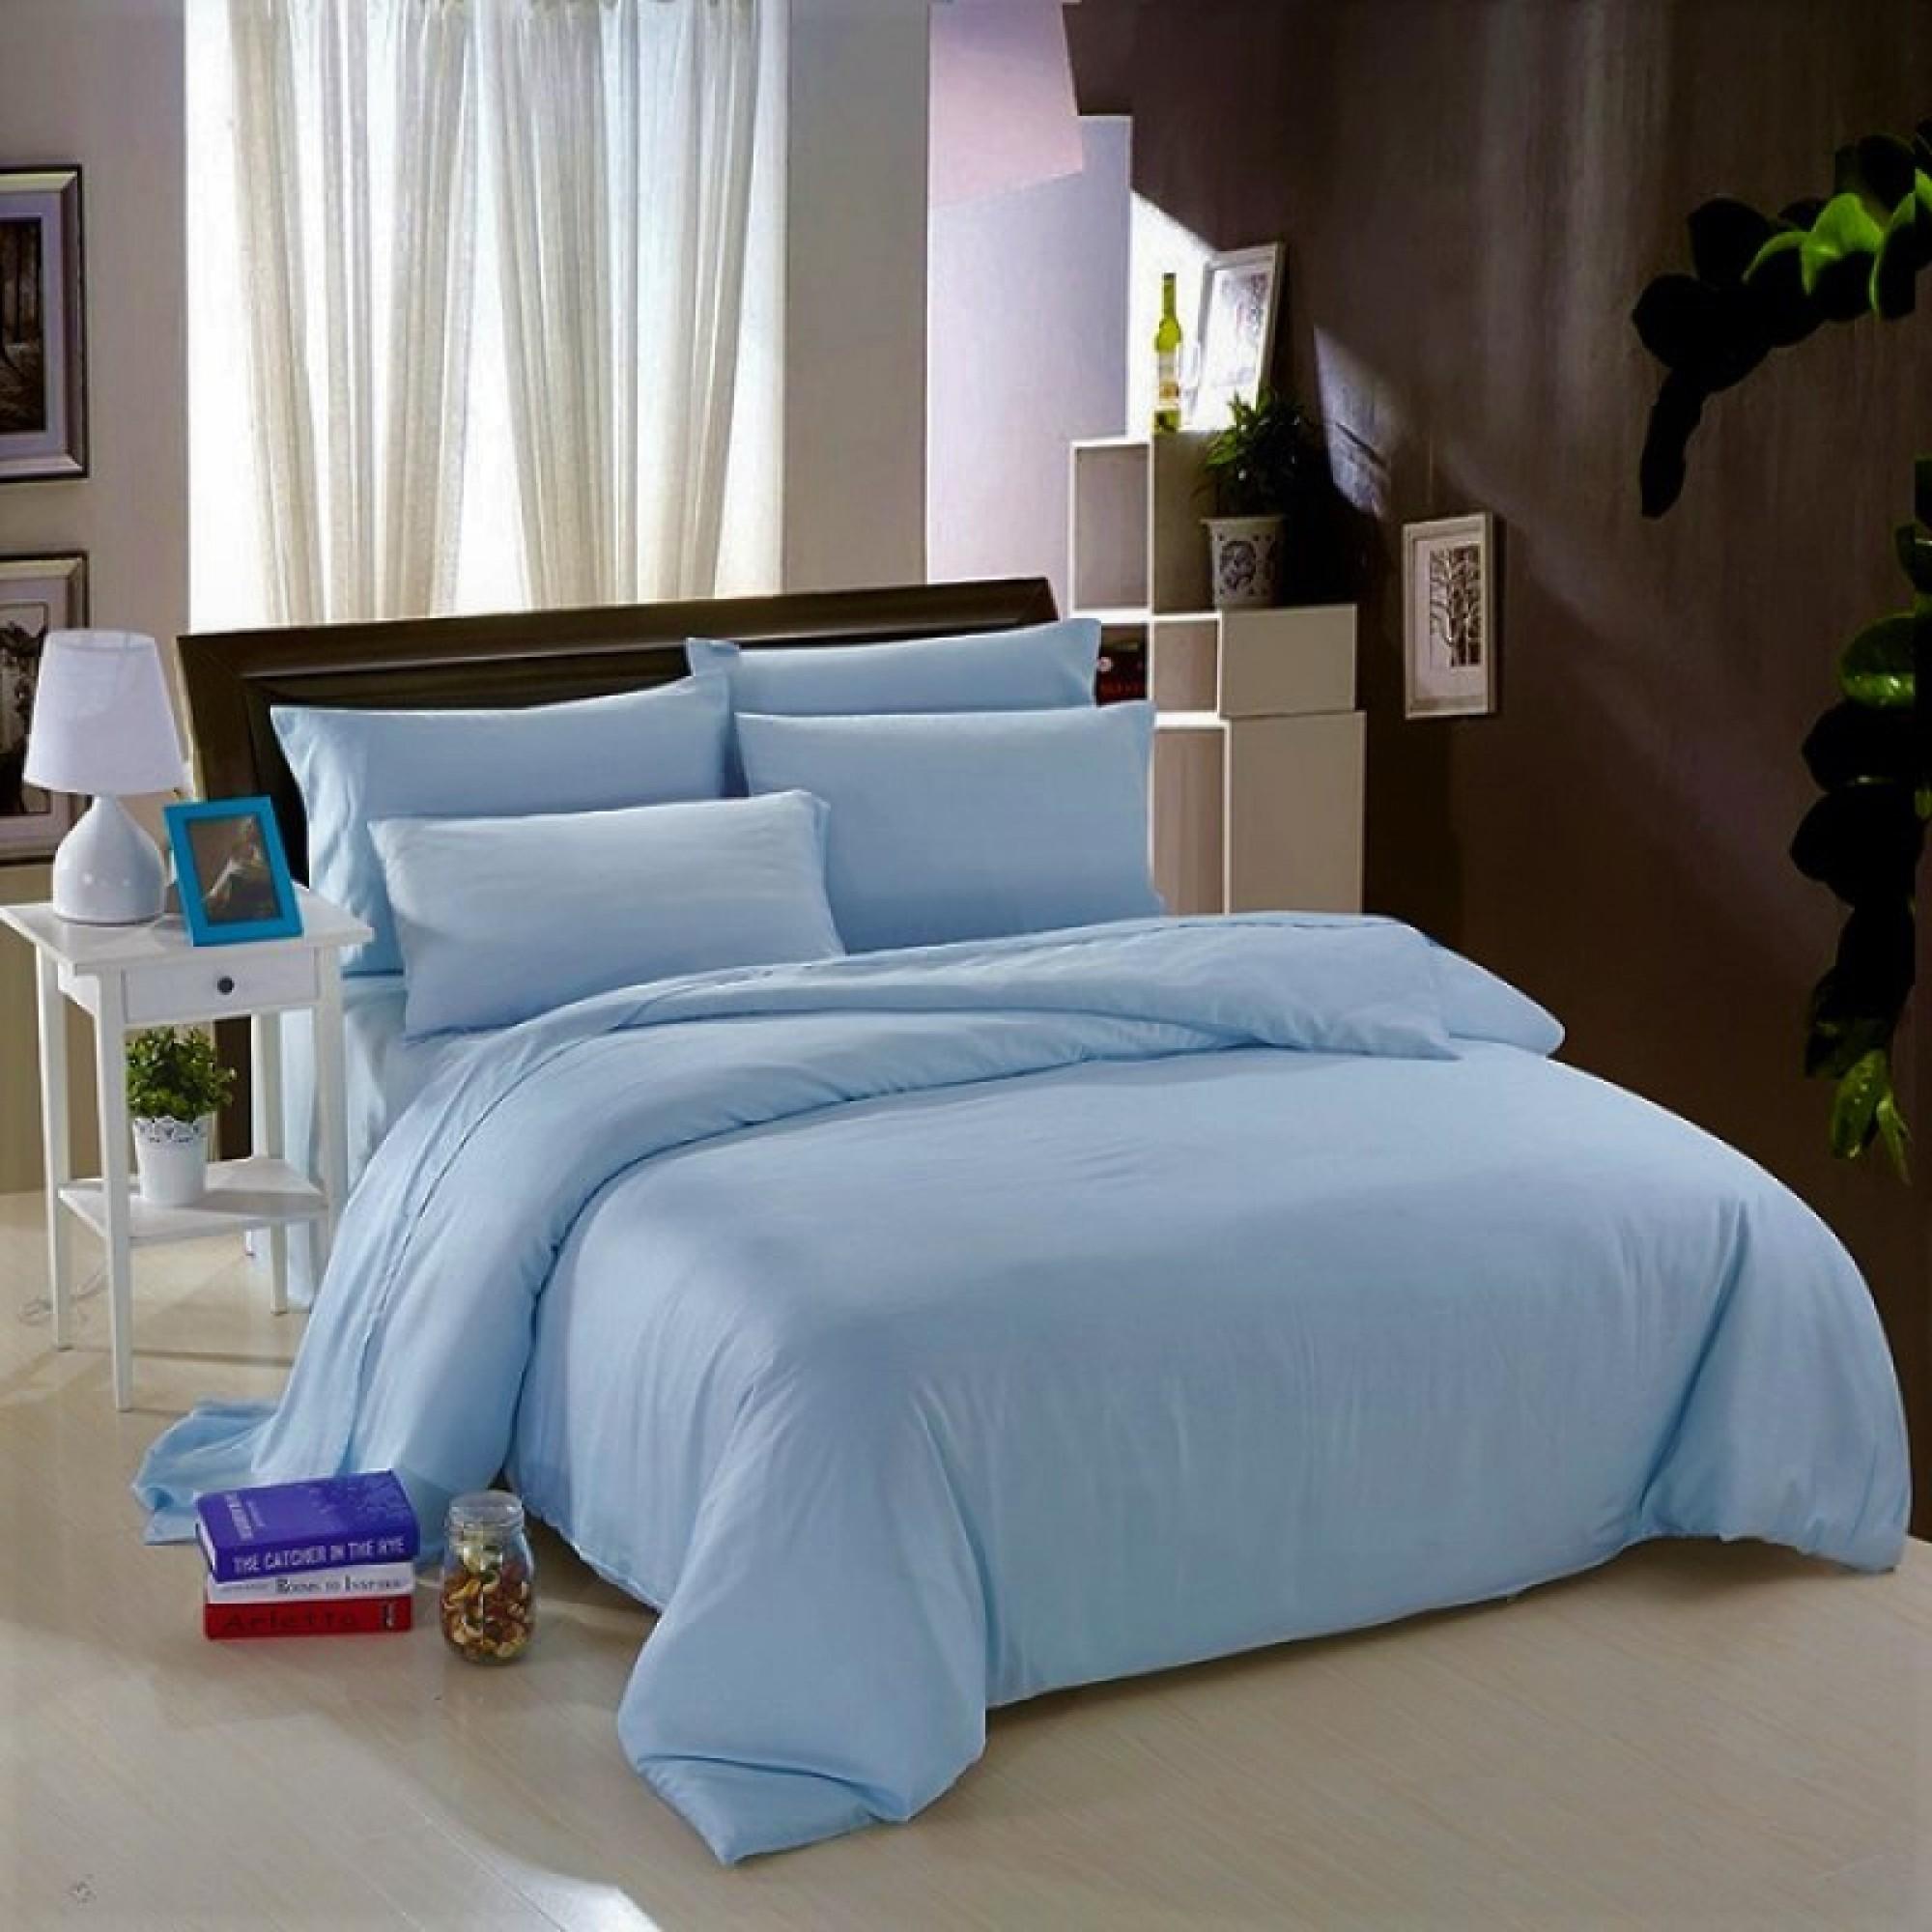 Спално бельо от Ранфорс 100% Памук в синьо